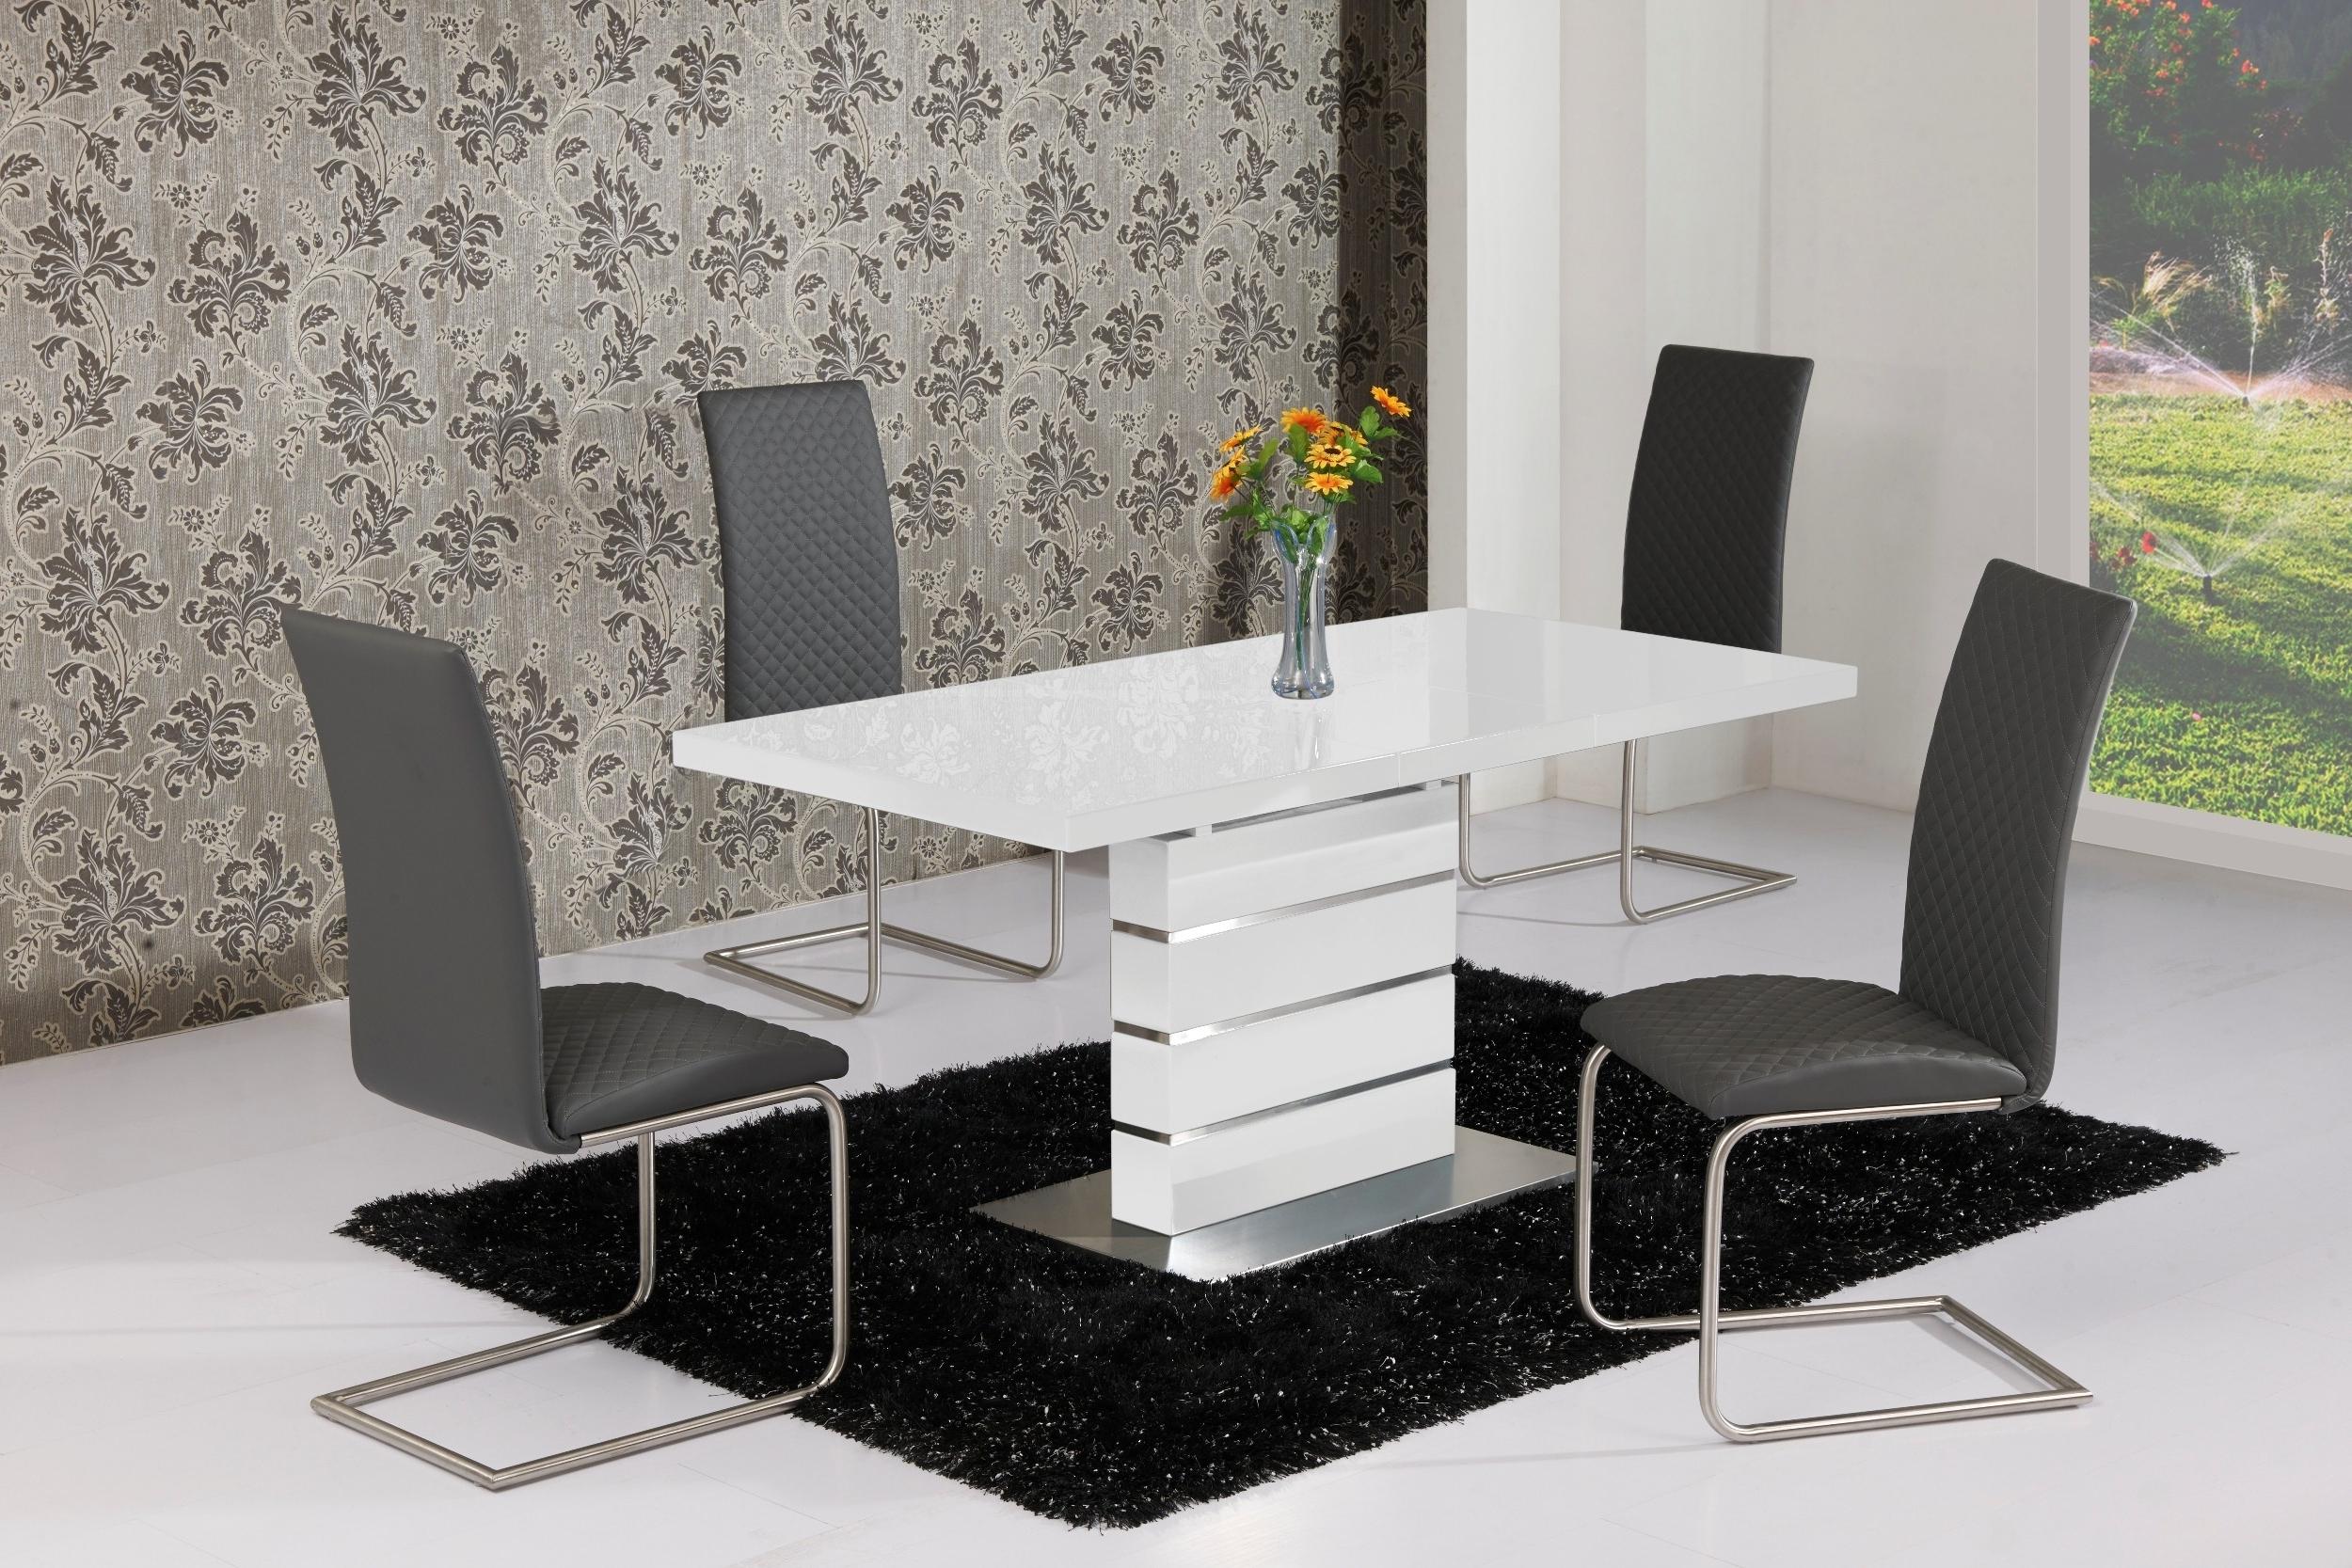 High Gloss Dining Tables intended for Trendy Buy Allison Stylish High Gloss White Extending Table 120Cm - 160Cm